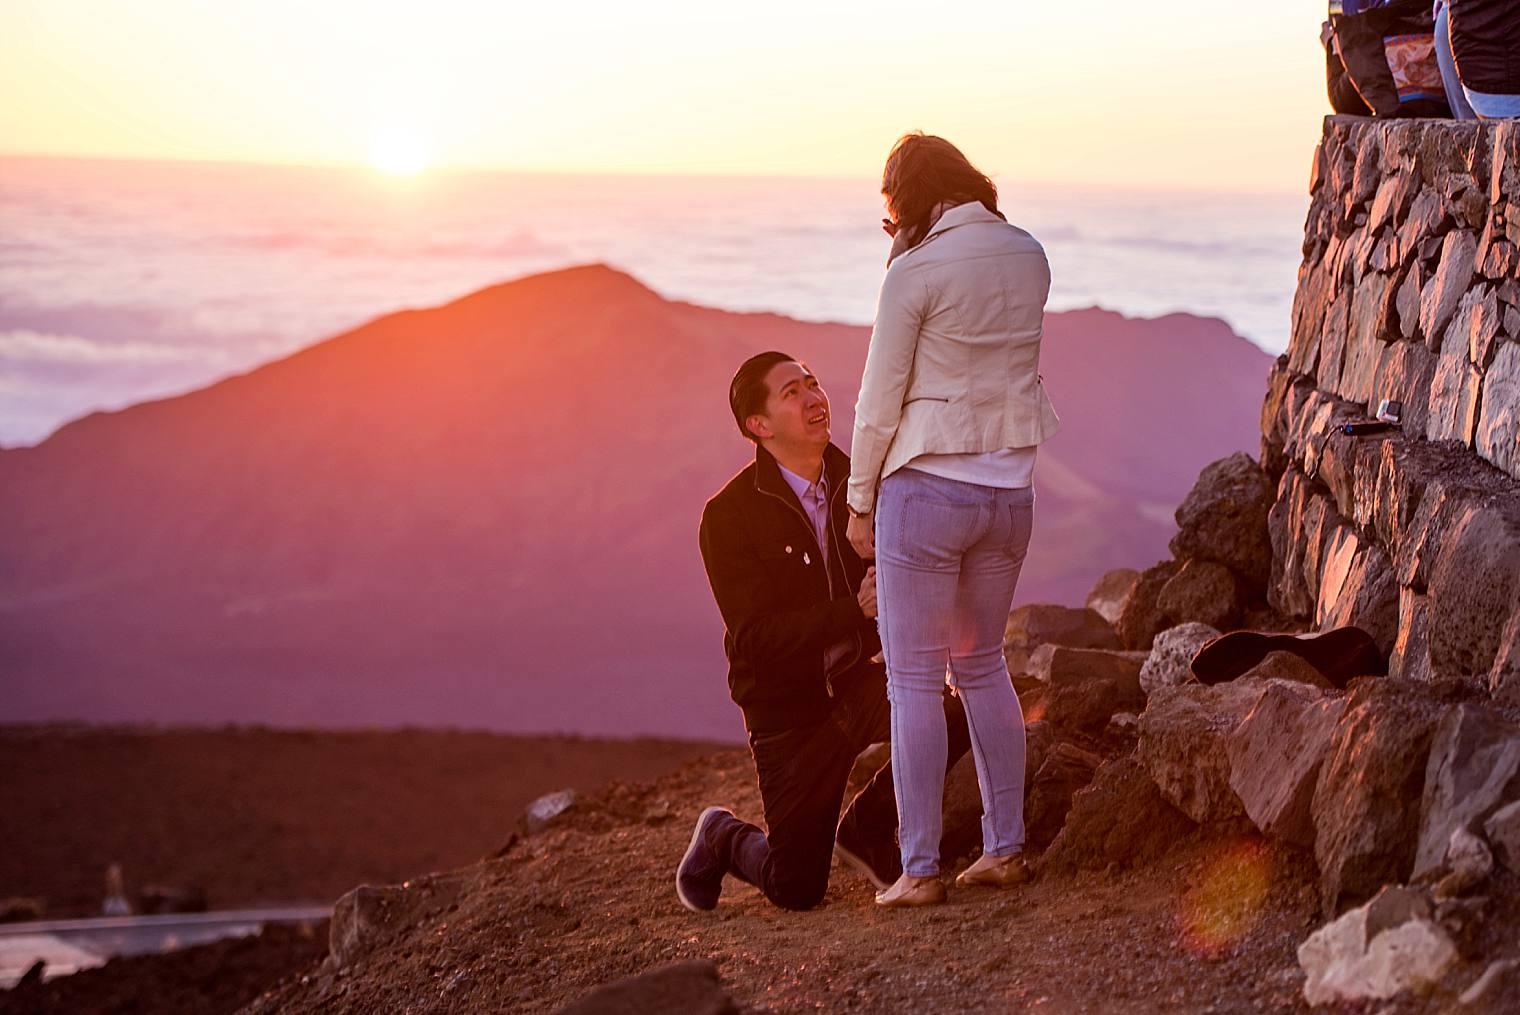 Al + Cristina  | Haleakala Sunrise Proposal in Maui, Hawaii